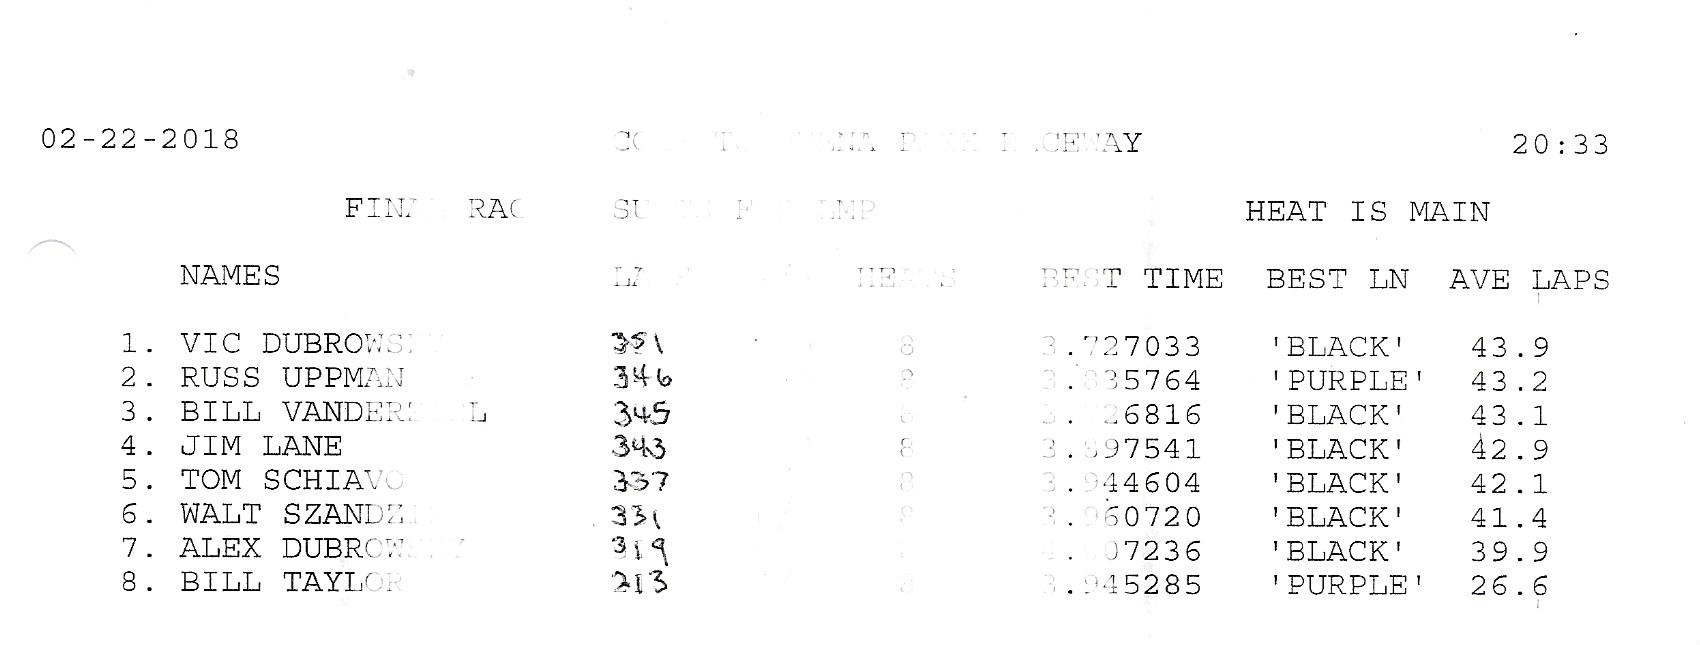 22218 lmp results.jpeg